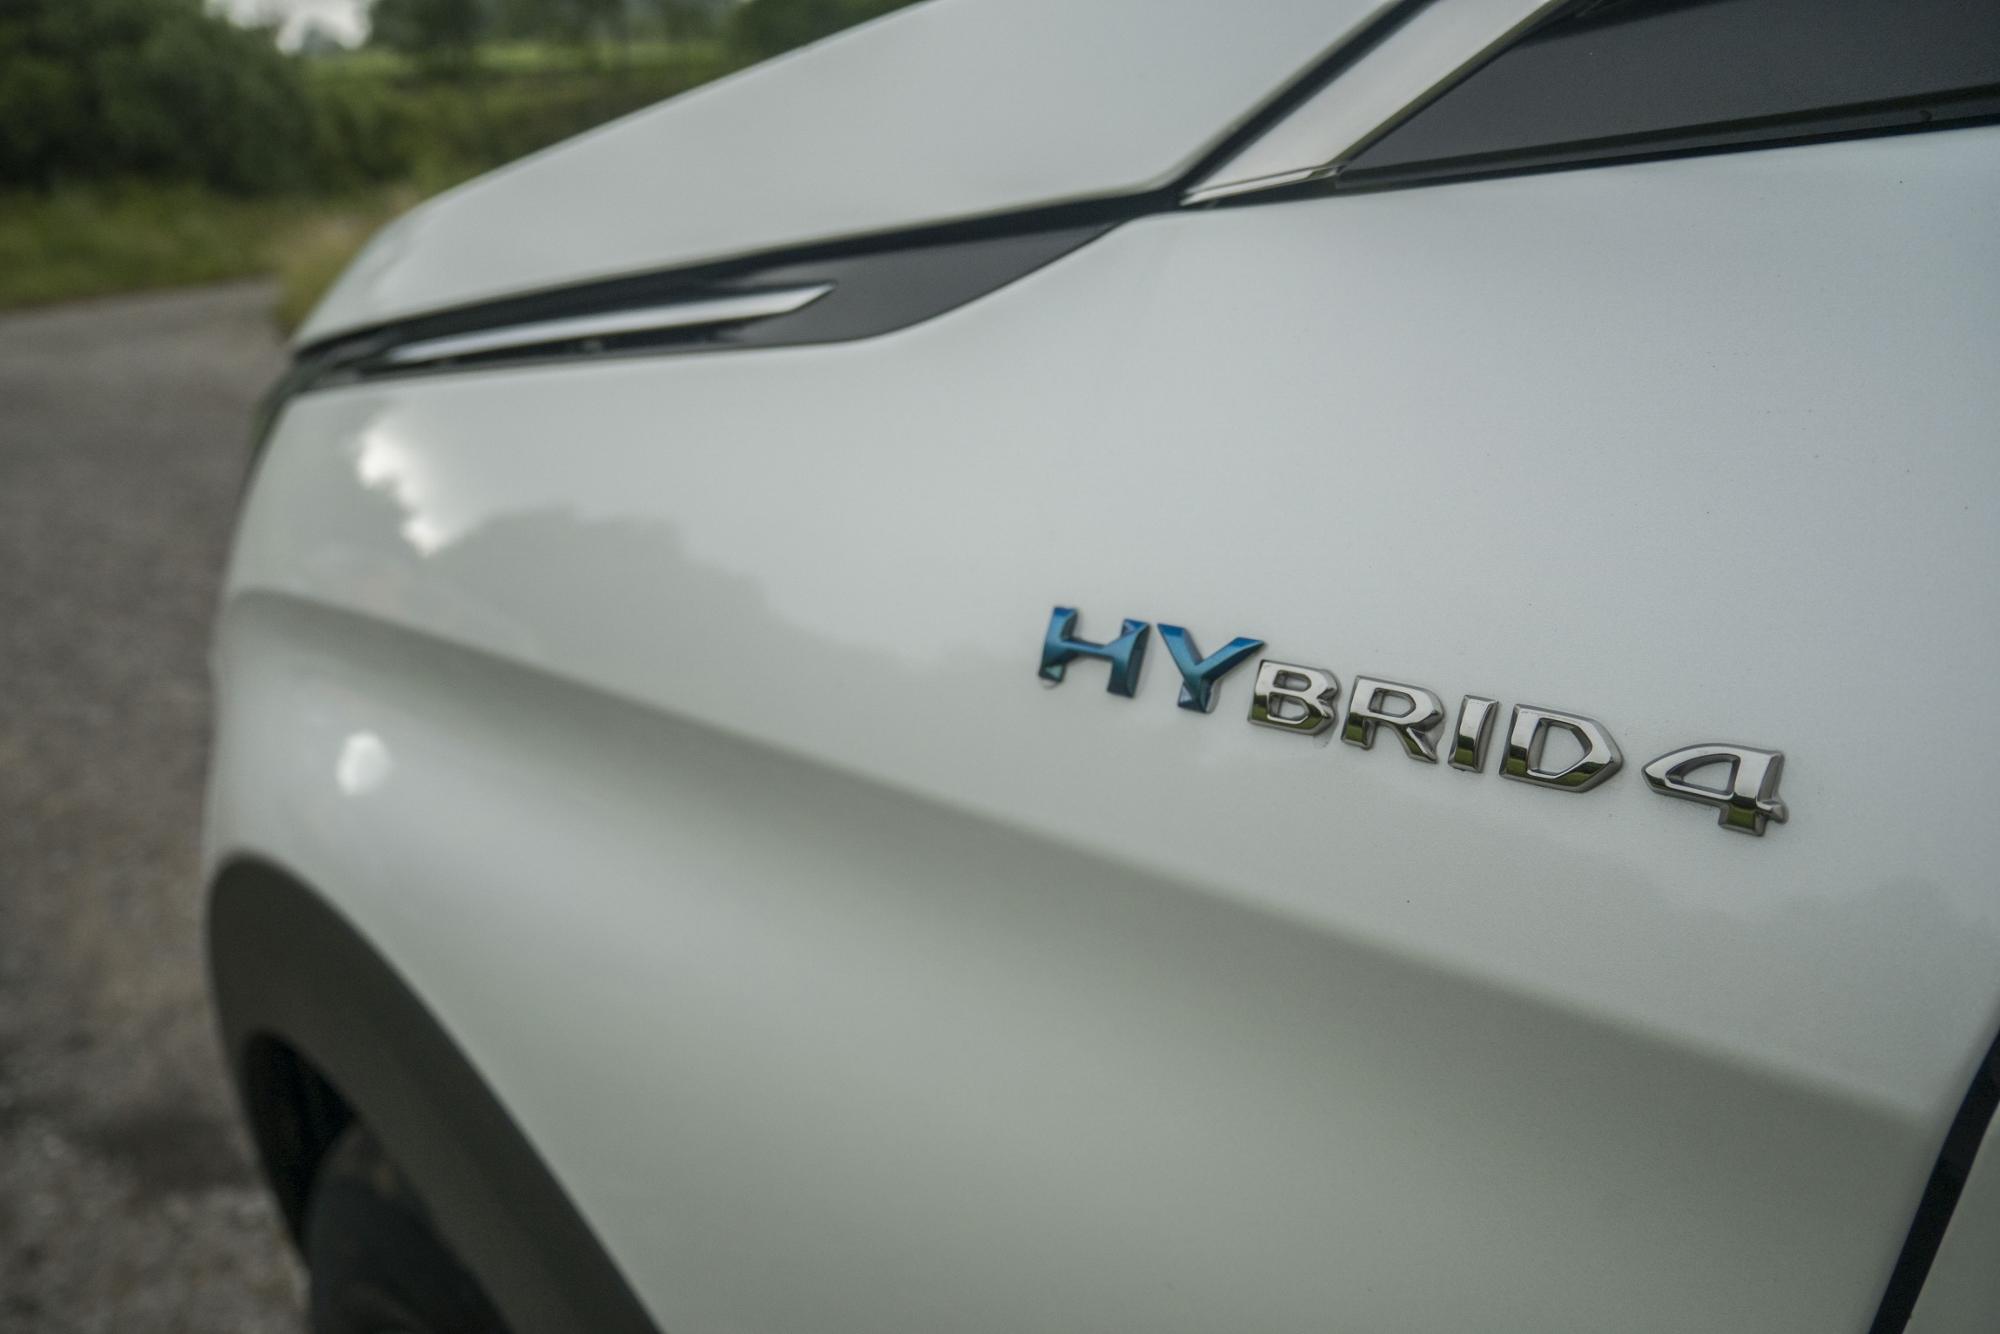 Peugeot 3008 Hybrid4 (20)